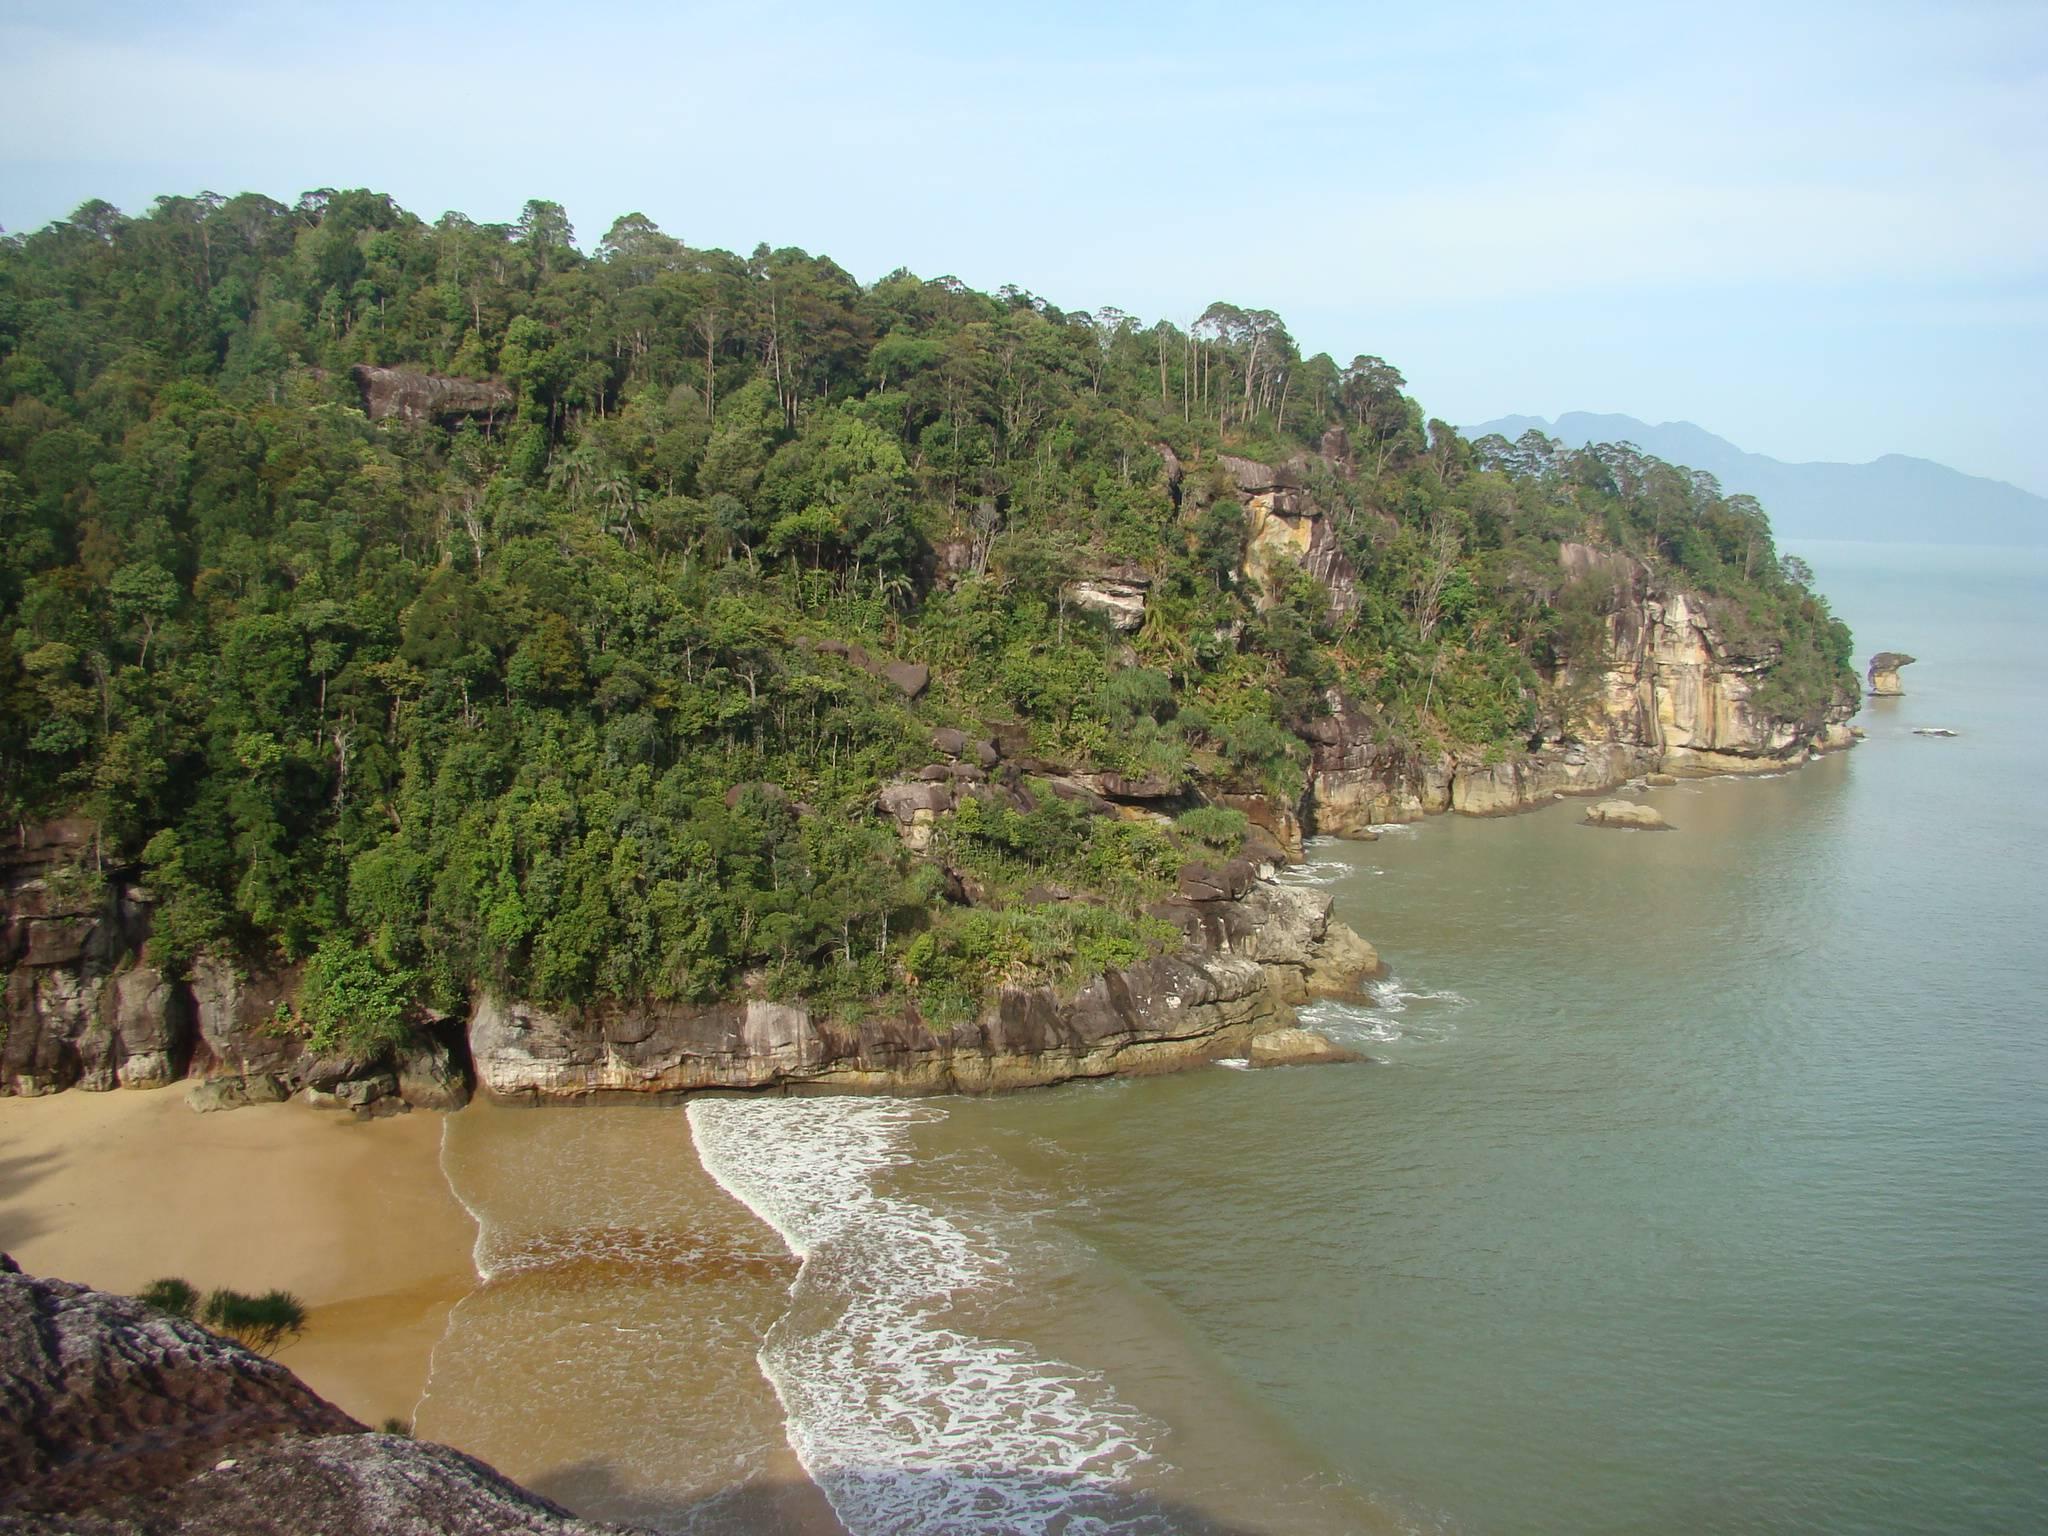 Photo 3: Bako, un joyau à Borneo